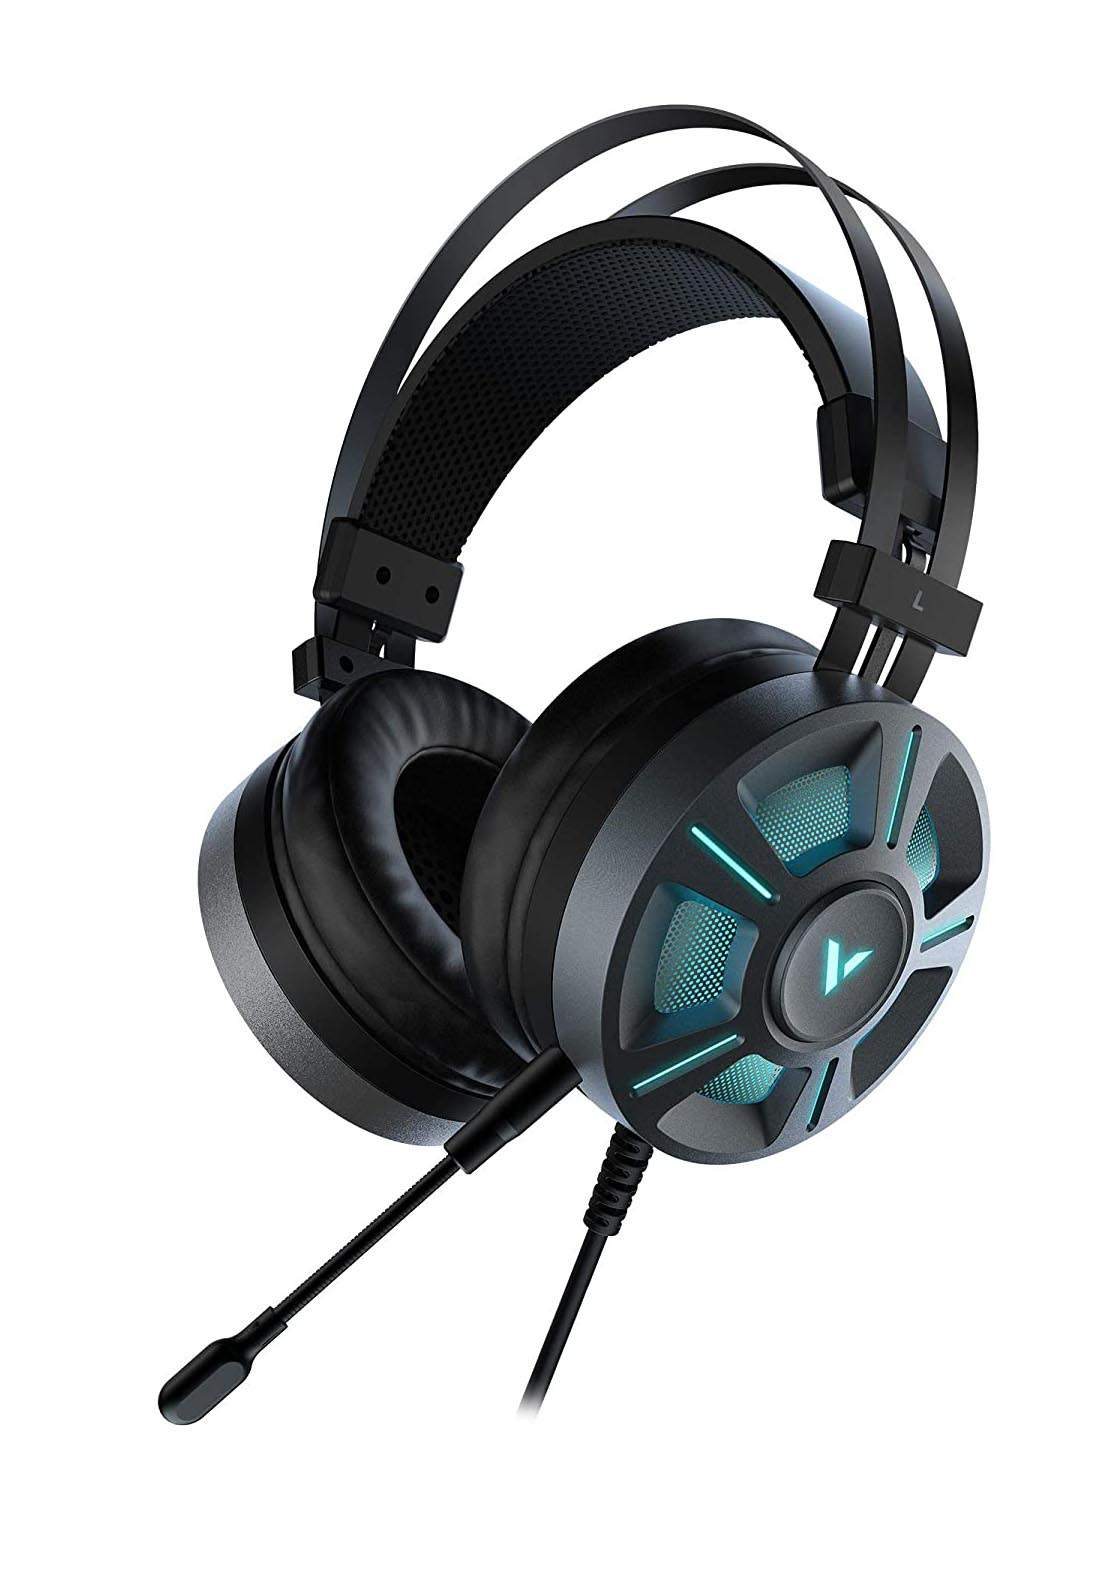 RAPOO VH510 RGB  Virtual 7.1 Gaming Headset  - Black سماعة